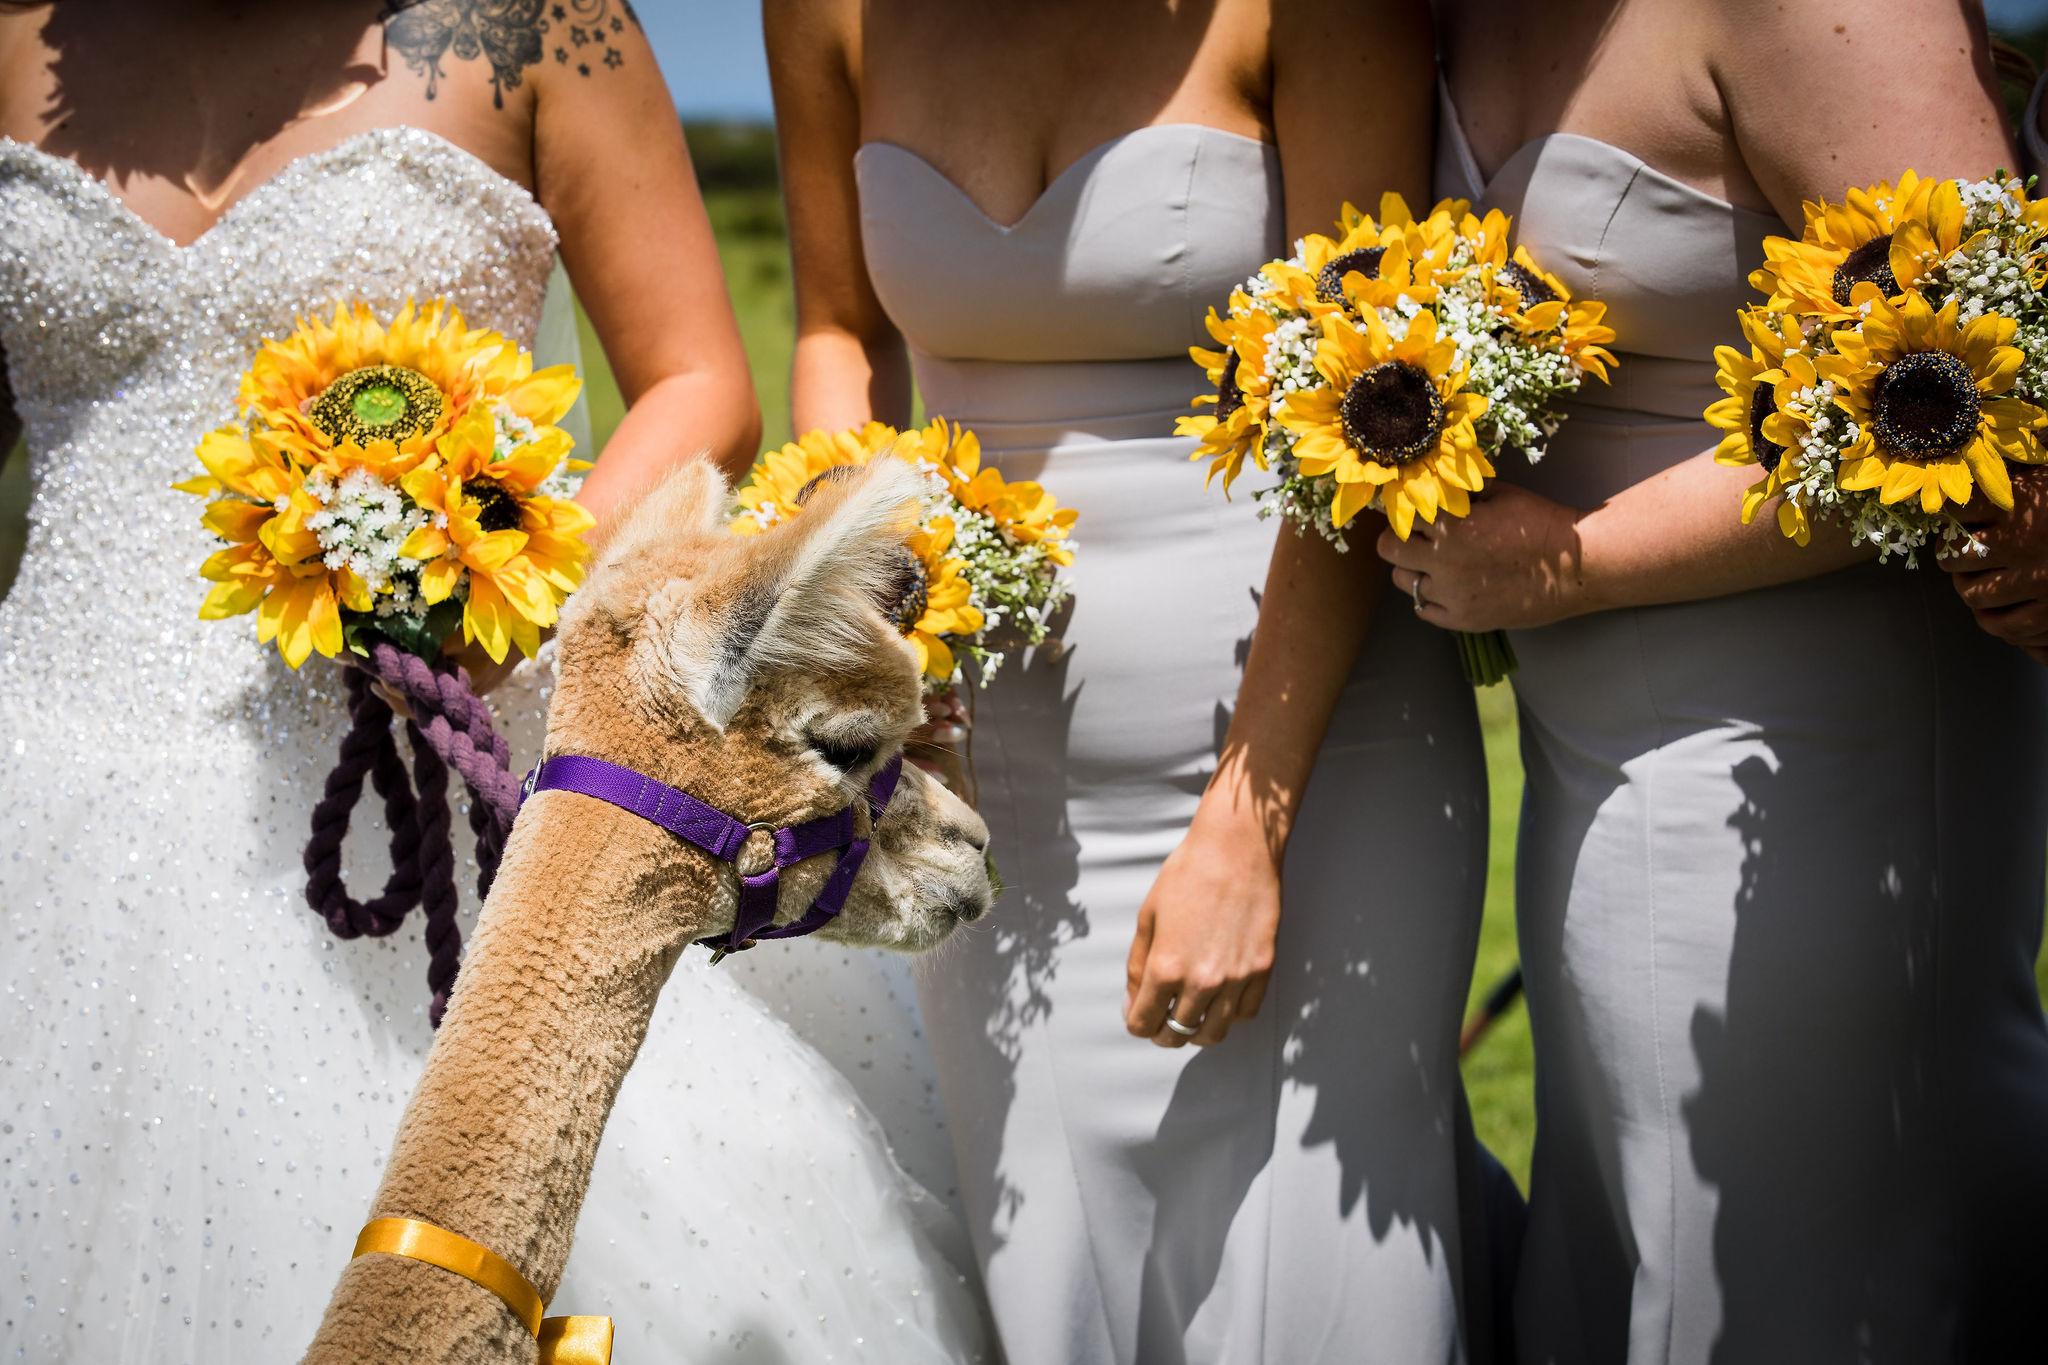 Harriet&Rhys Wedding - Magical sunflower wedding - quirky wedding with dodgems (64)